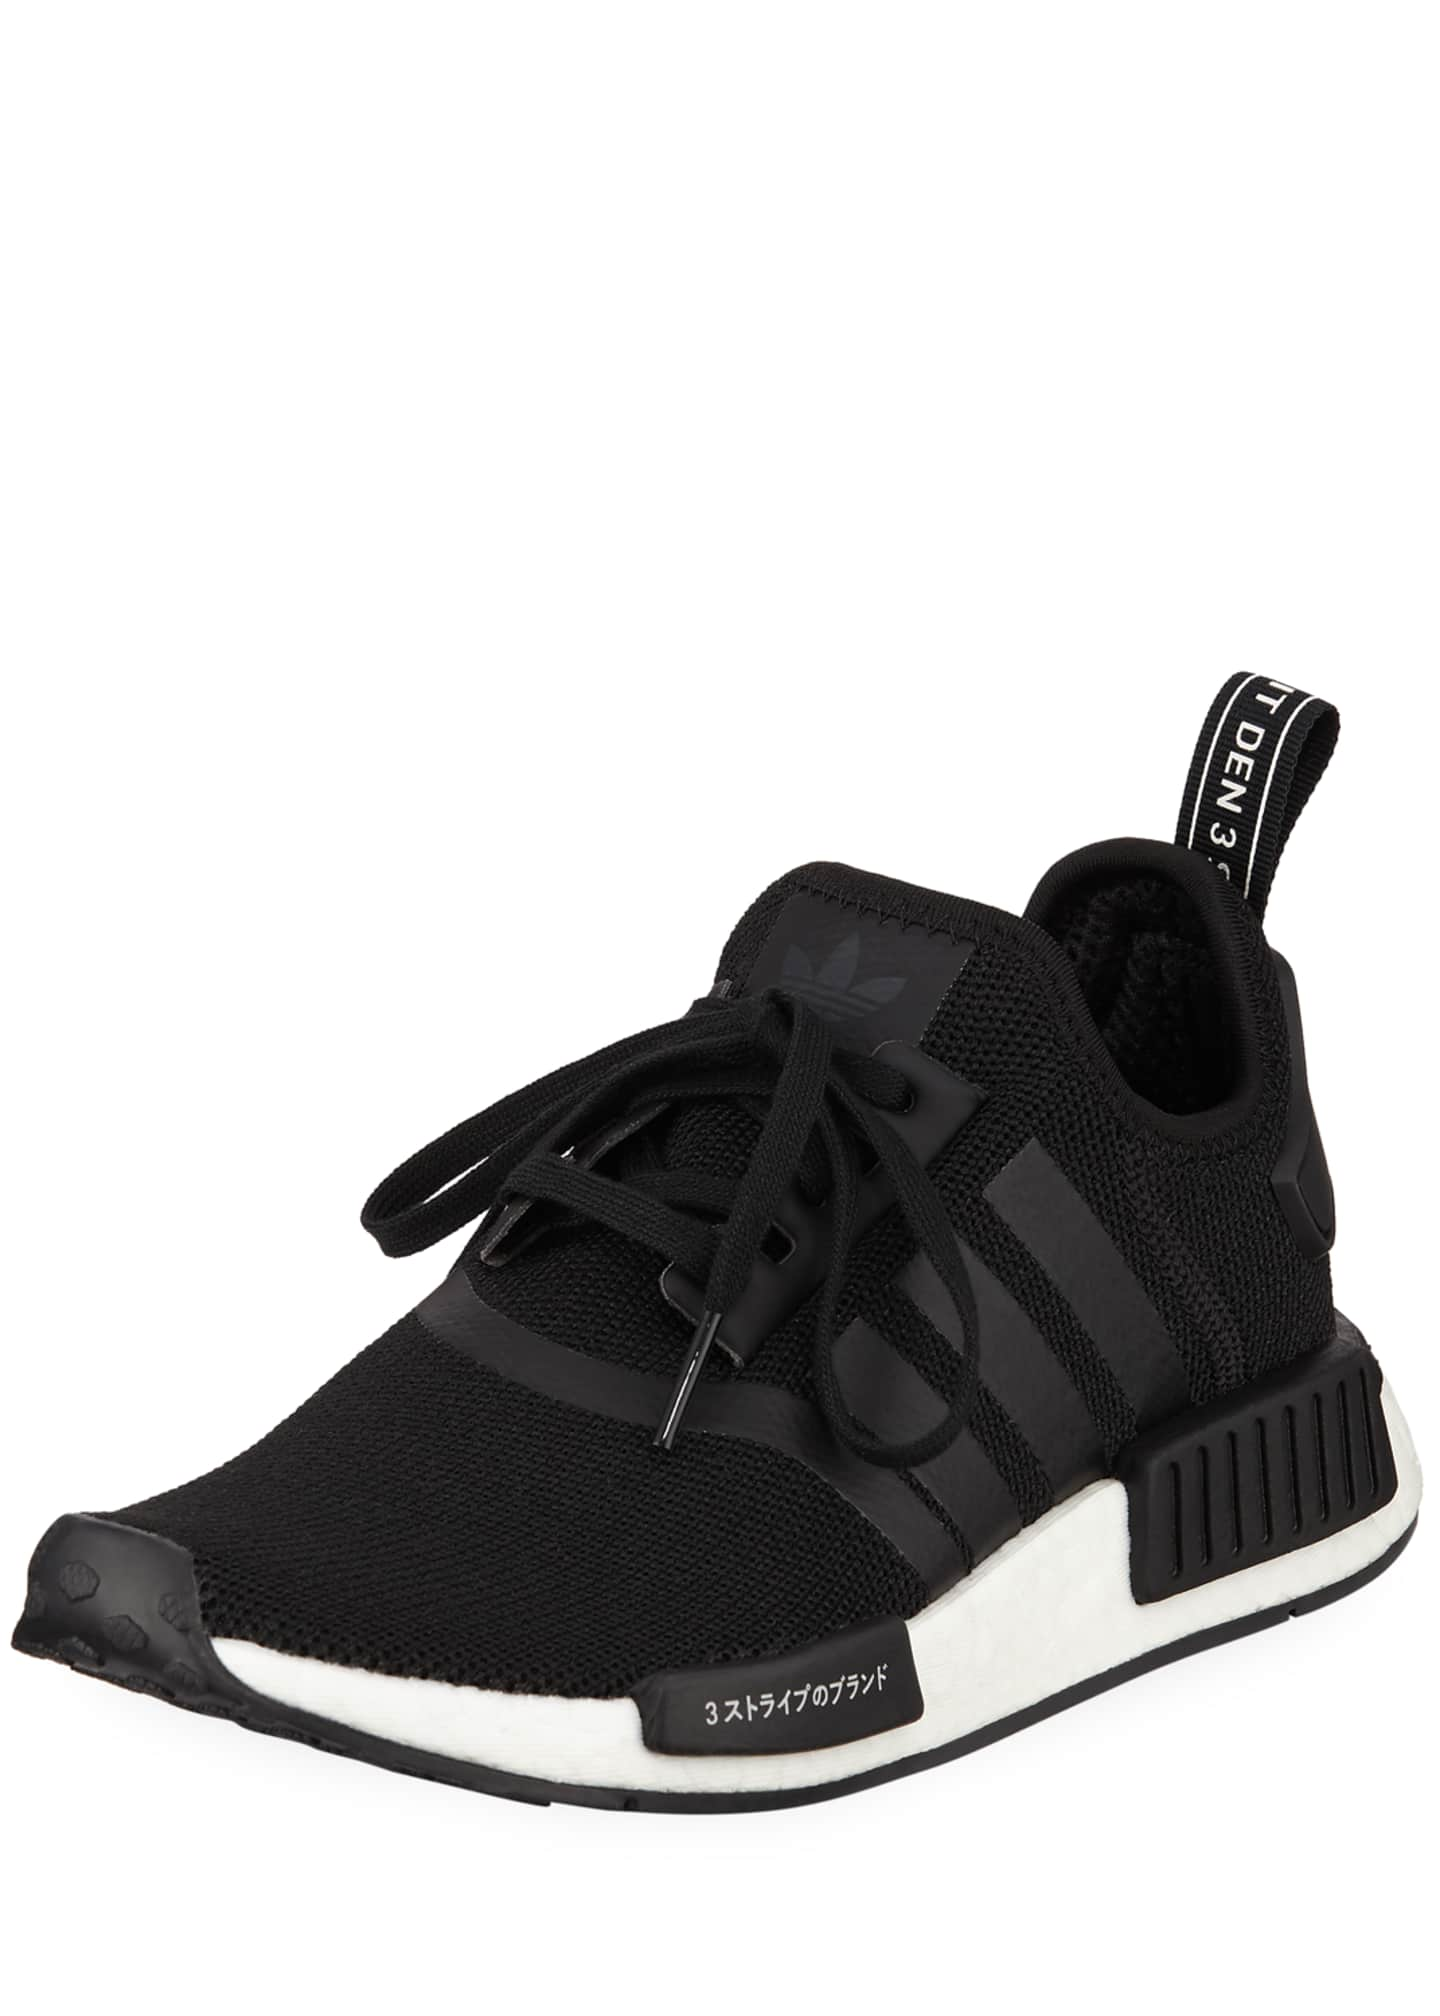 Adidas NMD_R1 Mesh Trainer Sneakers, Kids